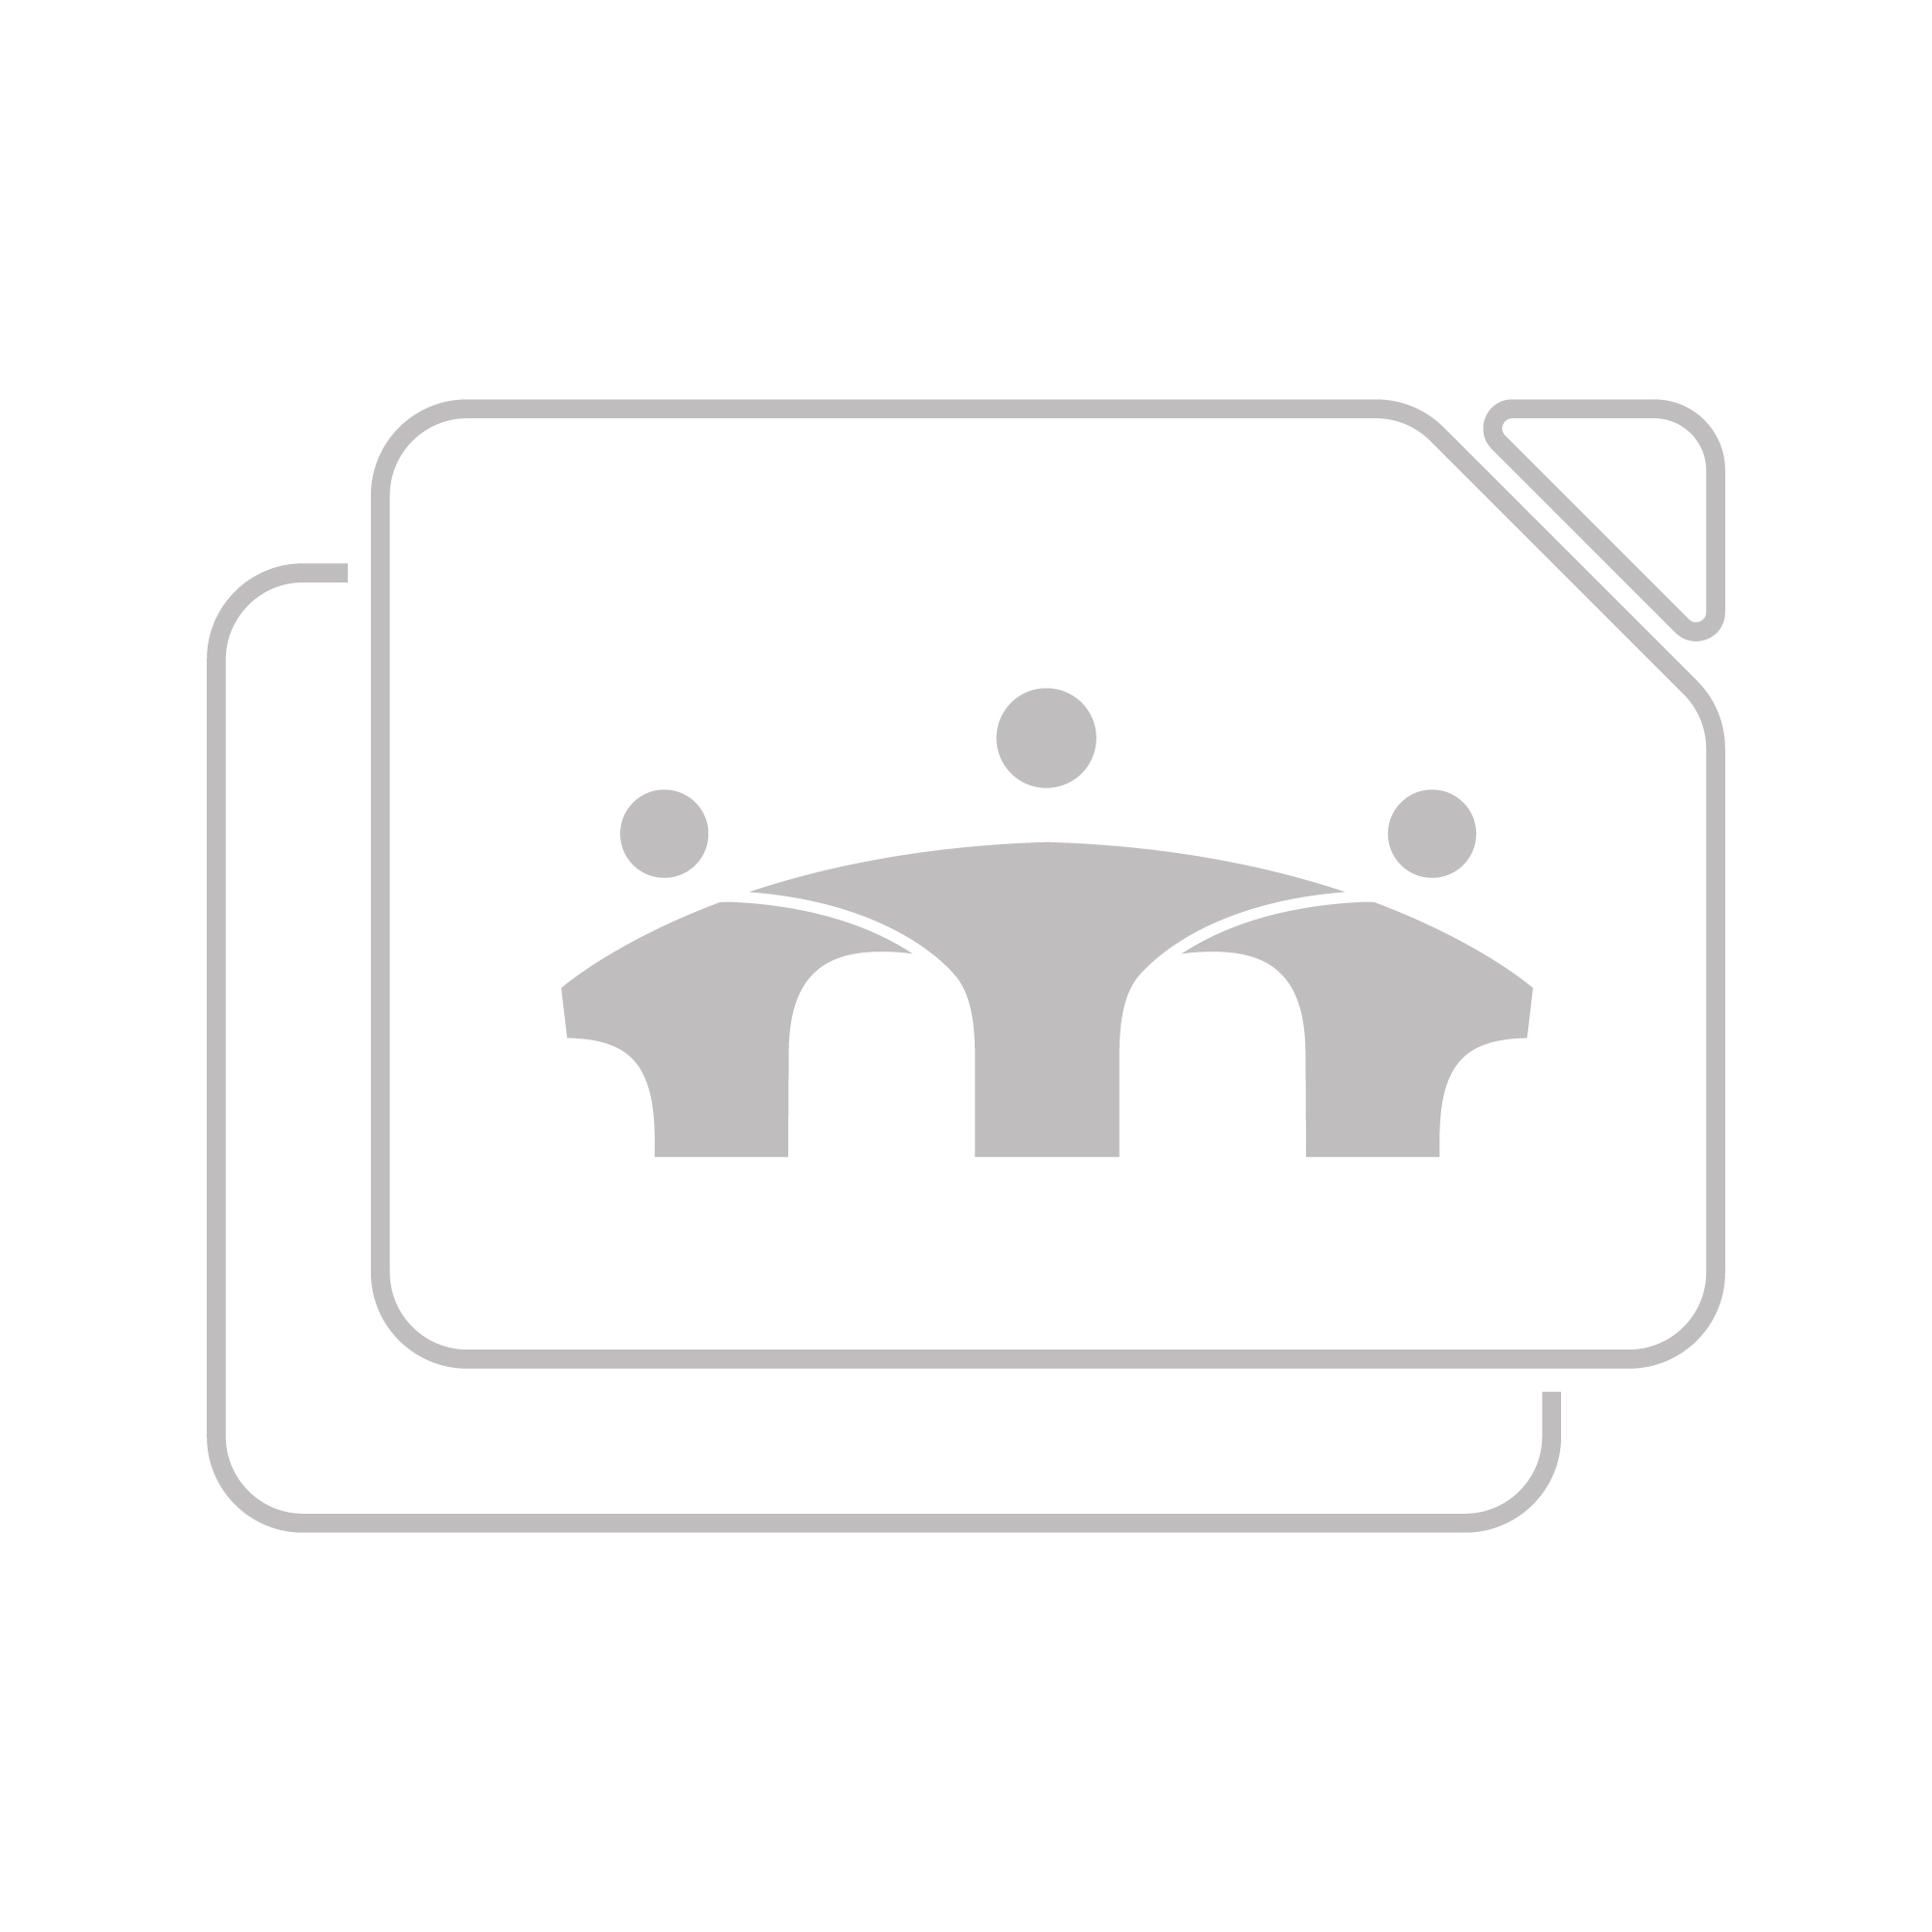 Logitech G815 LIGHTSYNC RGB Mechanical Gaming Keyboard – GL Linear - CARBON - DEU - CENTRAL